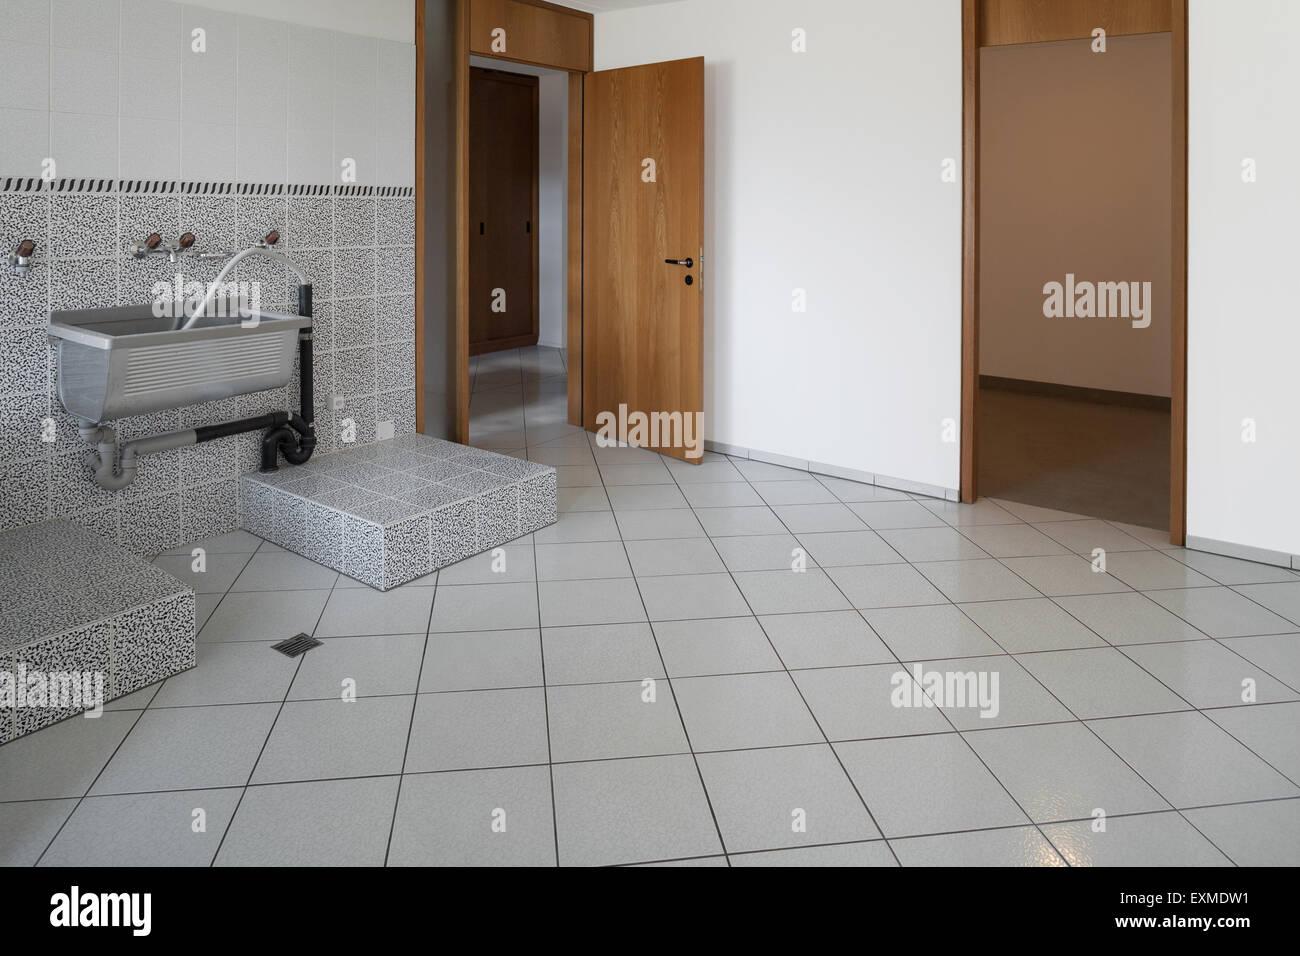 Interni Casa Grigio : Interni casa vuota servizio lavanderia grigio pavimento